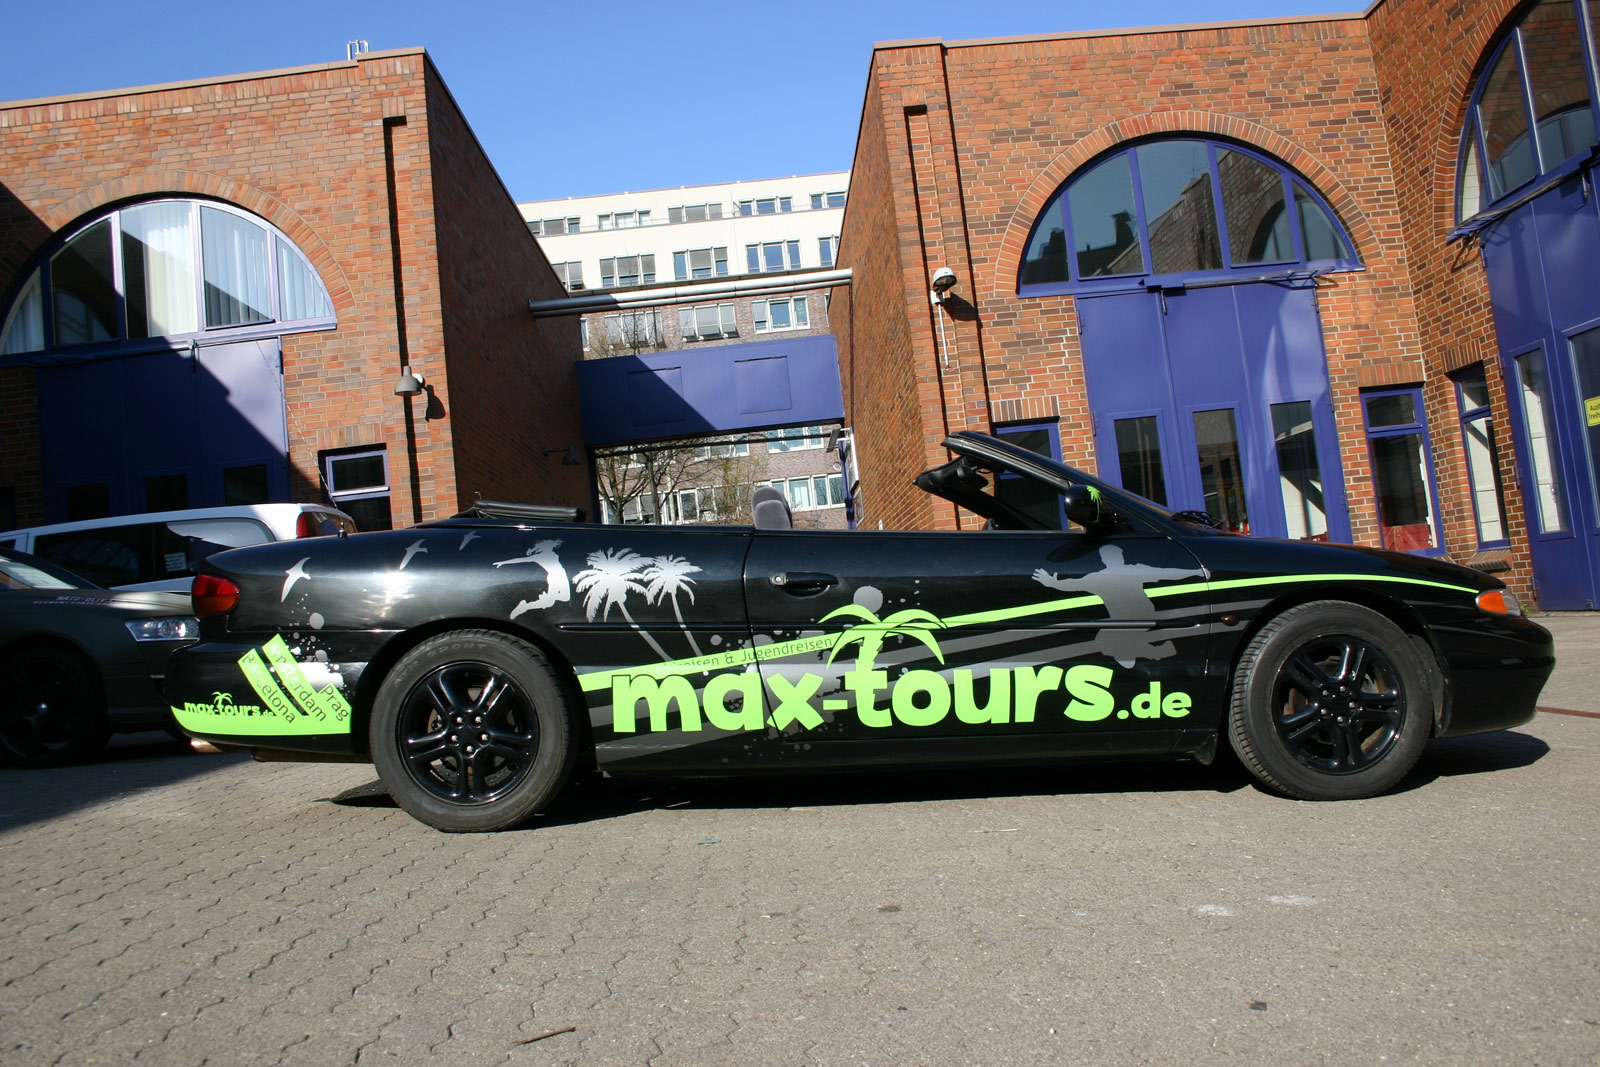 STRATUS_BEKLEBUNG_GRUEN_ANTHRAZIT_MATT_METALLIC_MAX-TOURS_18